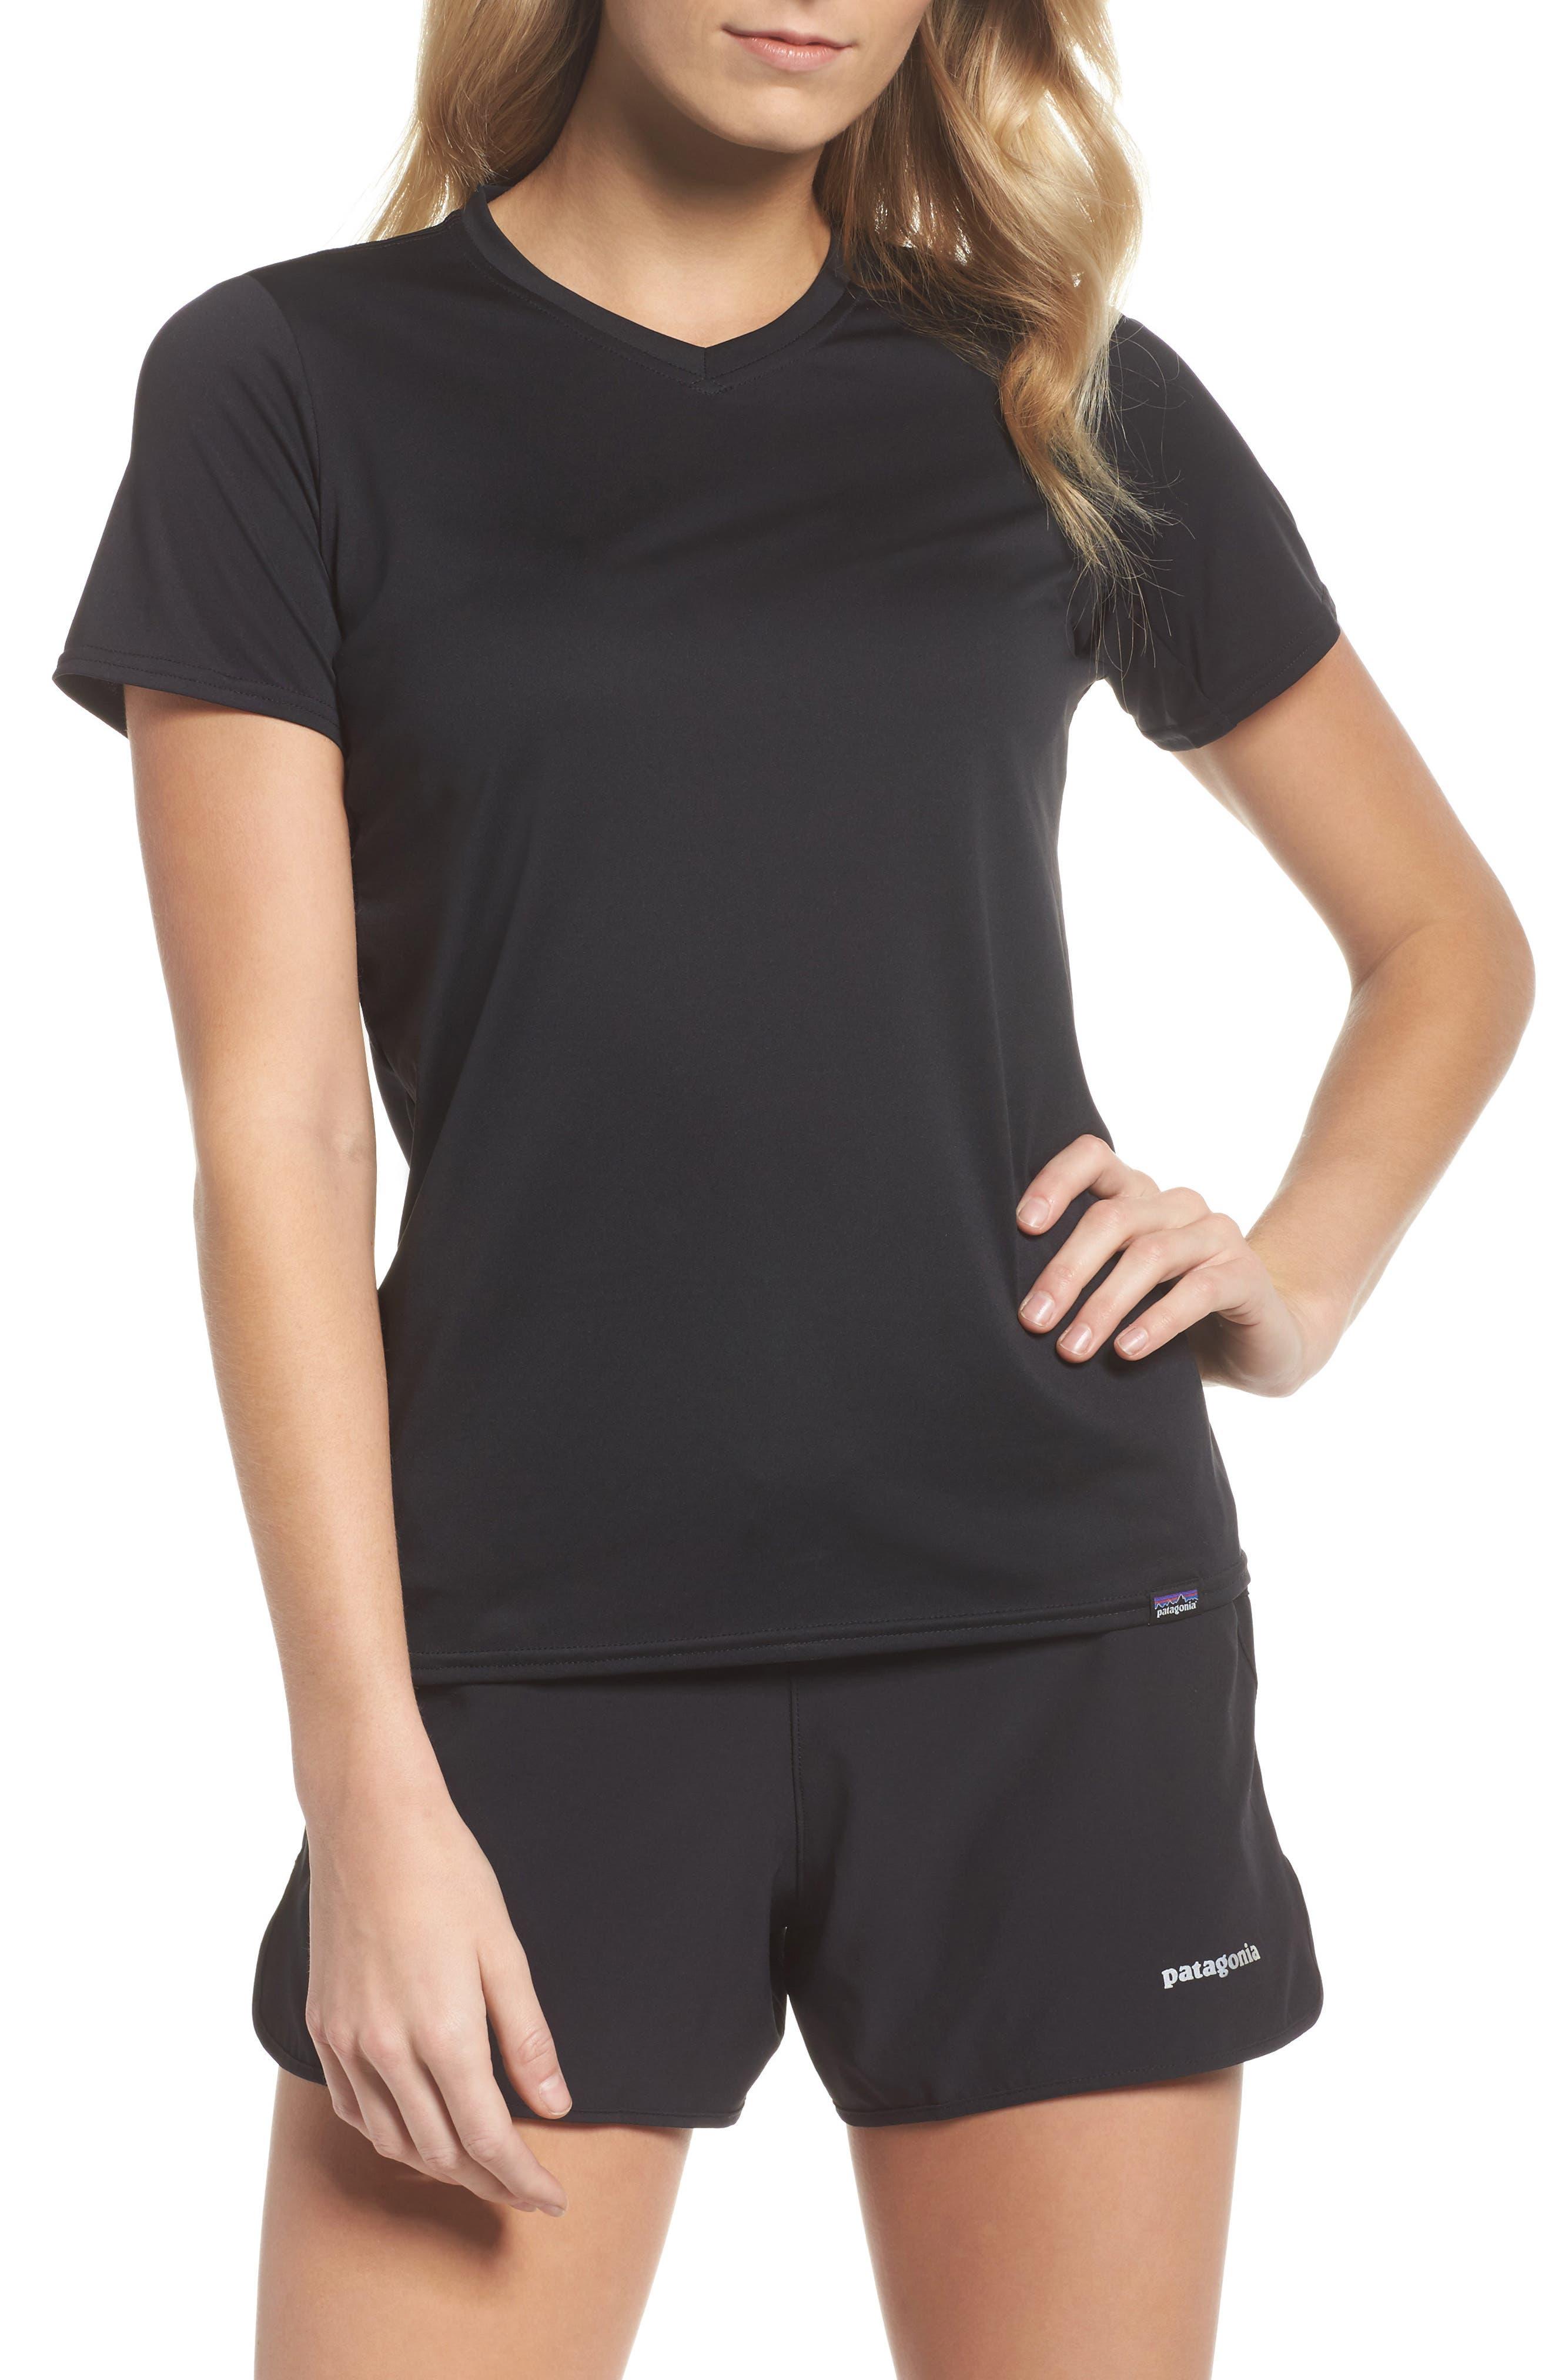 Capilene<sup>®</sup> Dailty T-Shirt,                         Main,                         color, Black